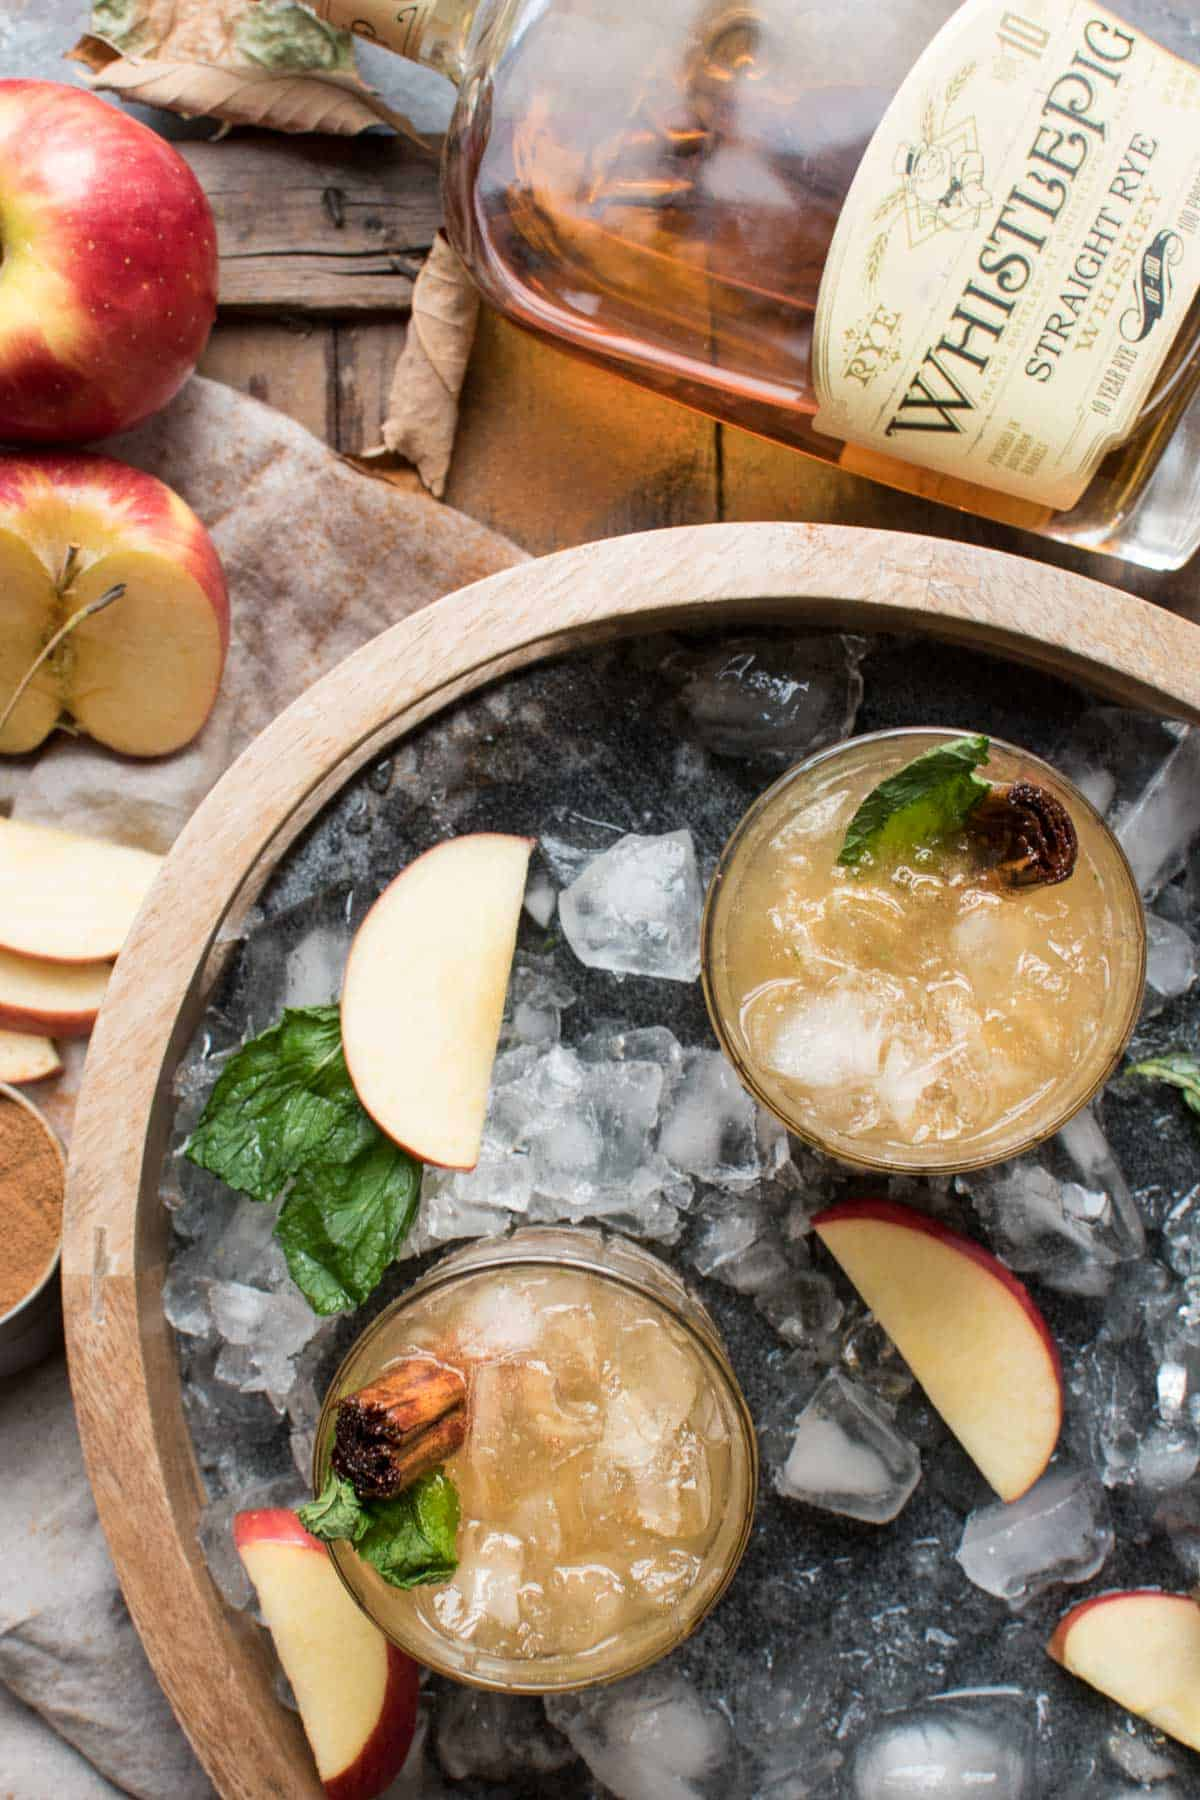 Cinnamon Apple Whiskey Smash 5 - Apple Cider Brine for Turkey and Pork